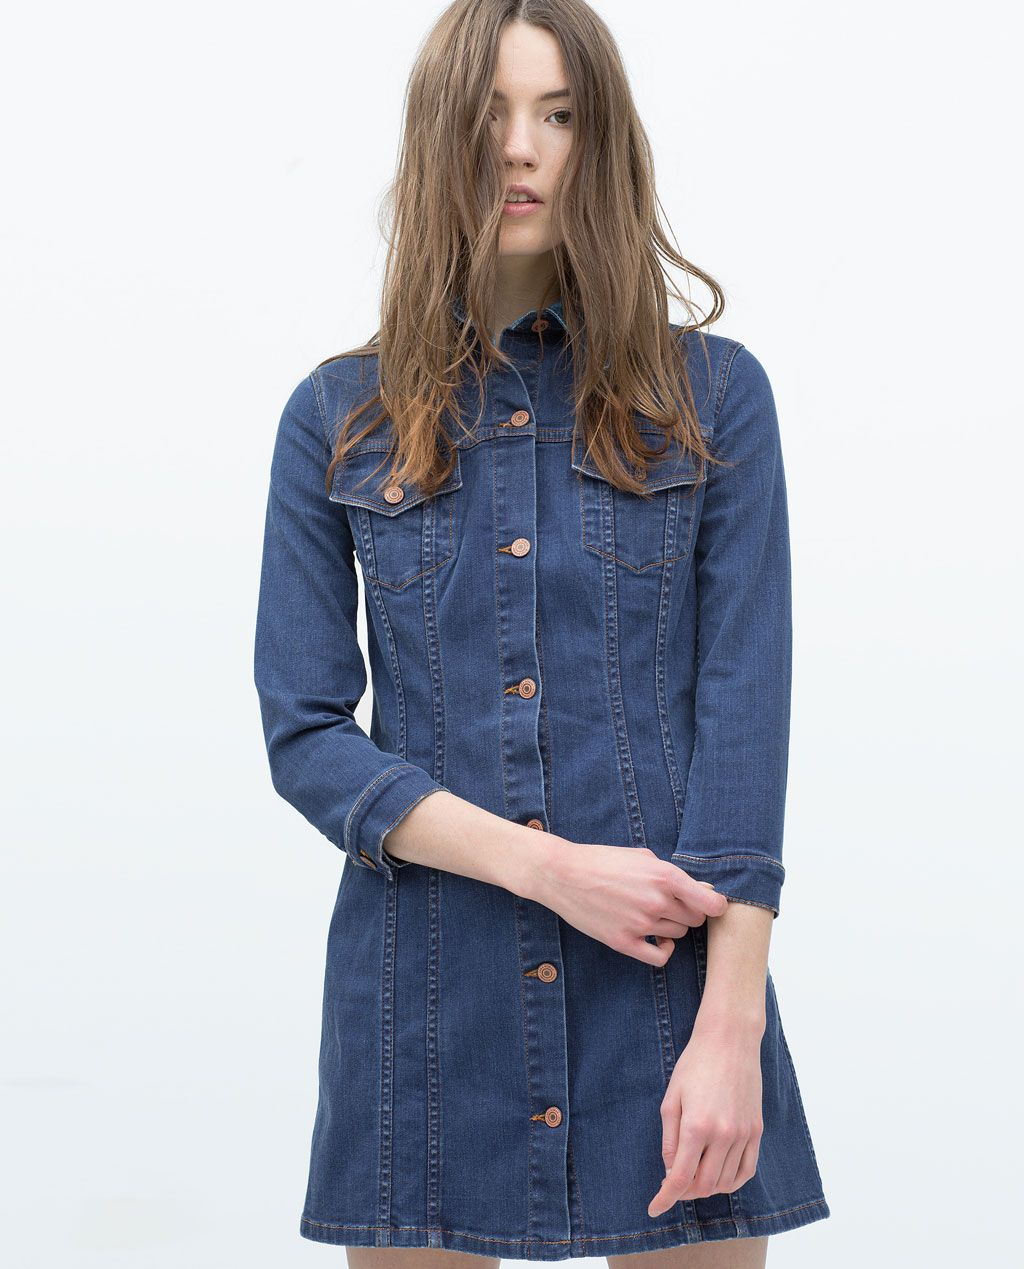 e3f6a6e486 Denim Dress-Woman-NEW THIS WEEK